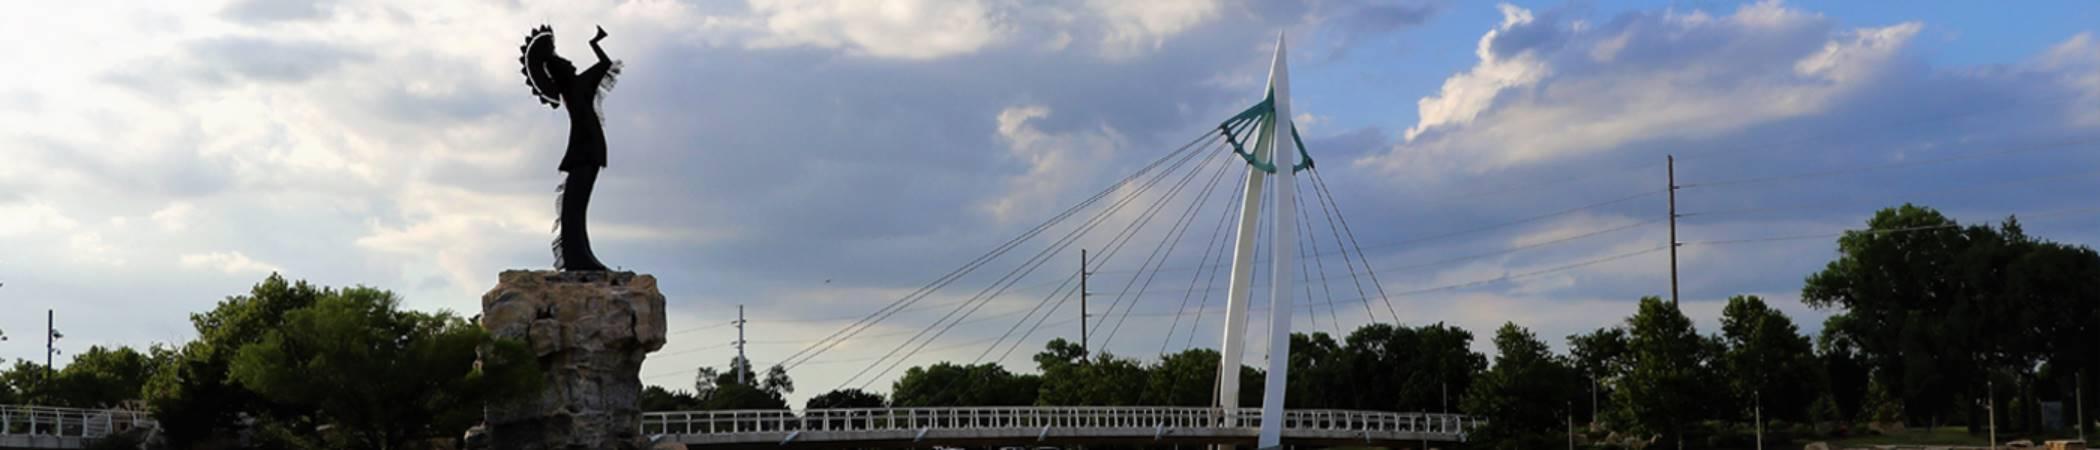 Jody Parker State Farm Insurance in Wichita, KS | Home, Auto Insurance & more